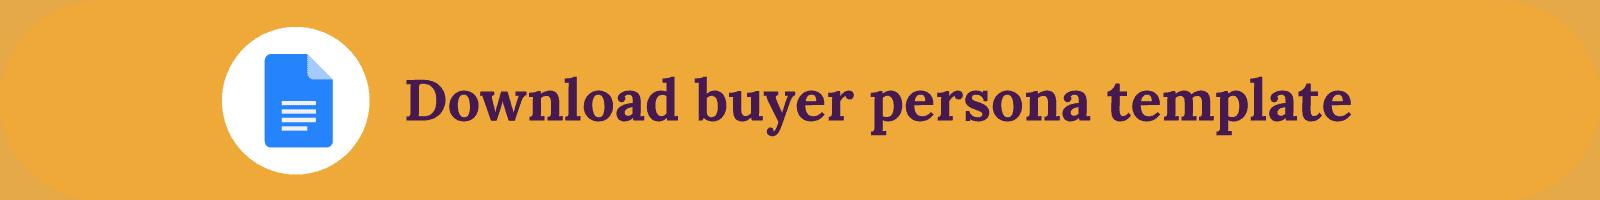 Buyer persona download template